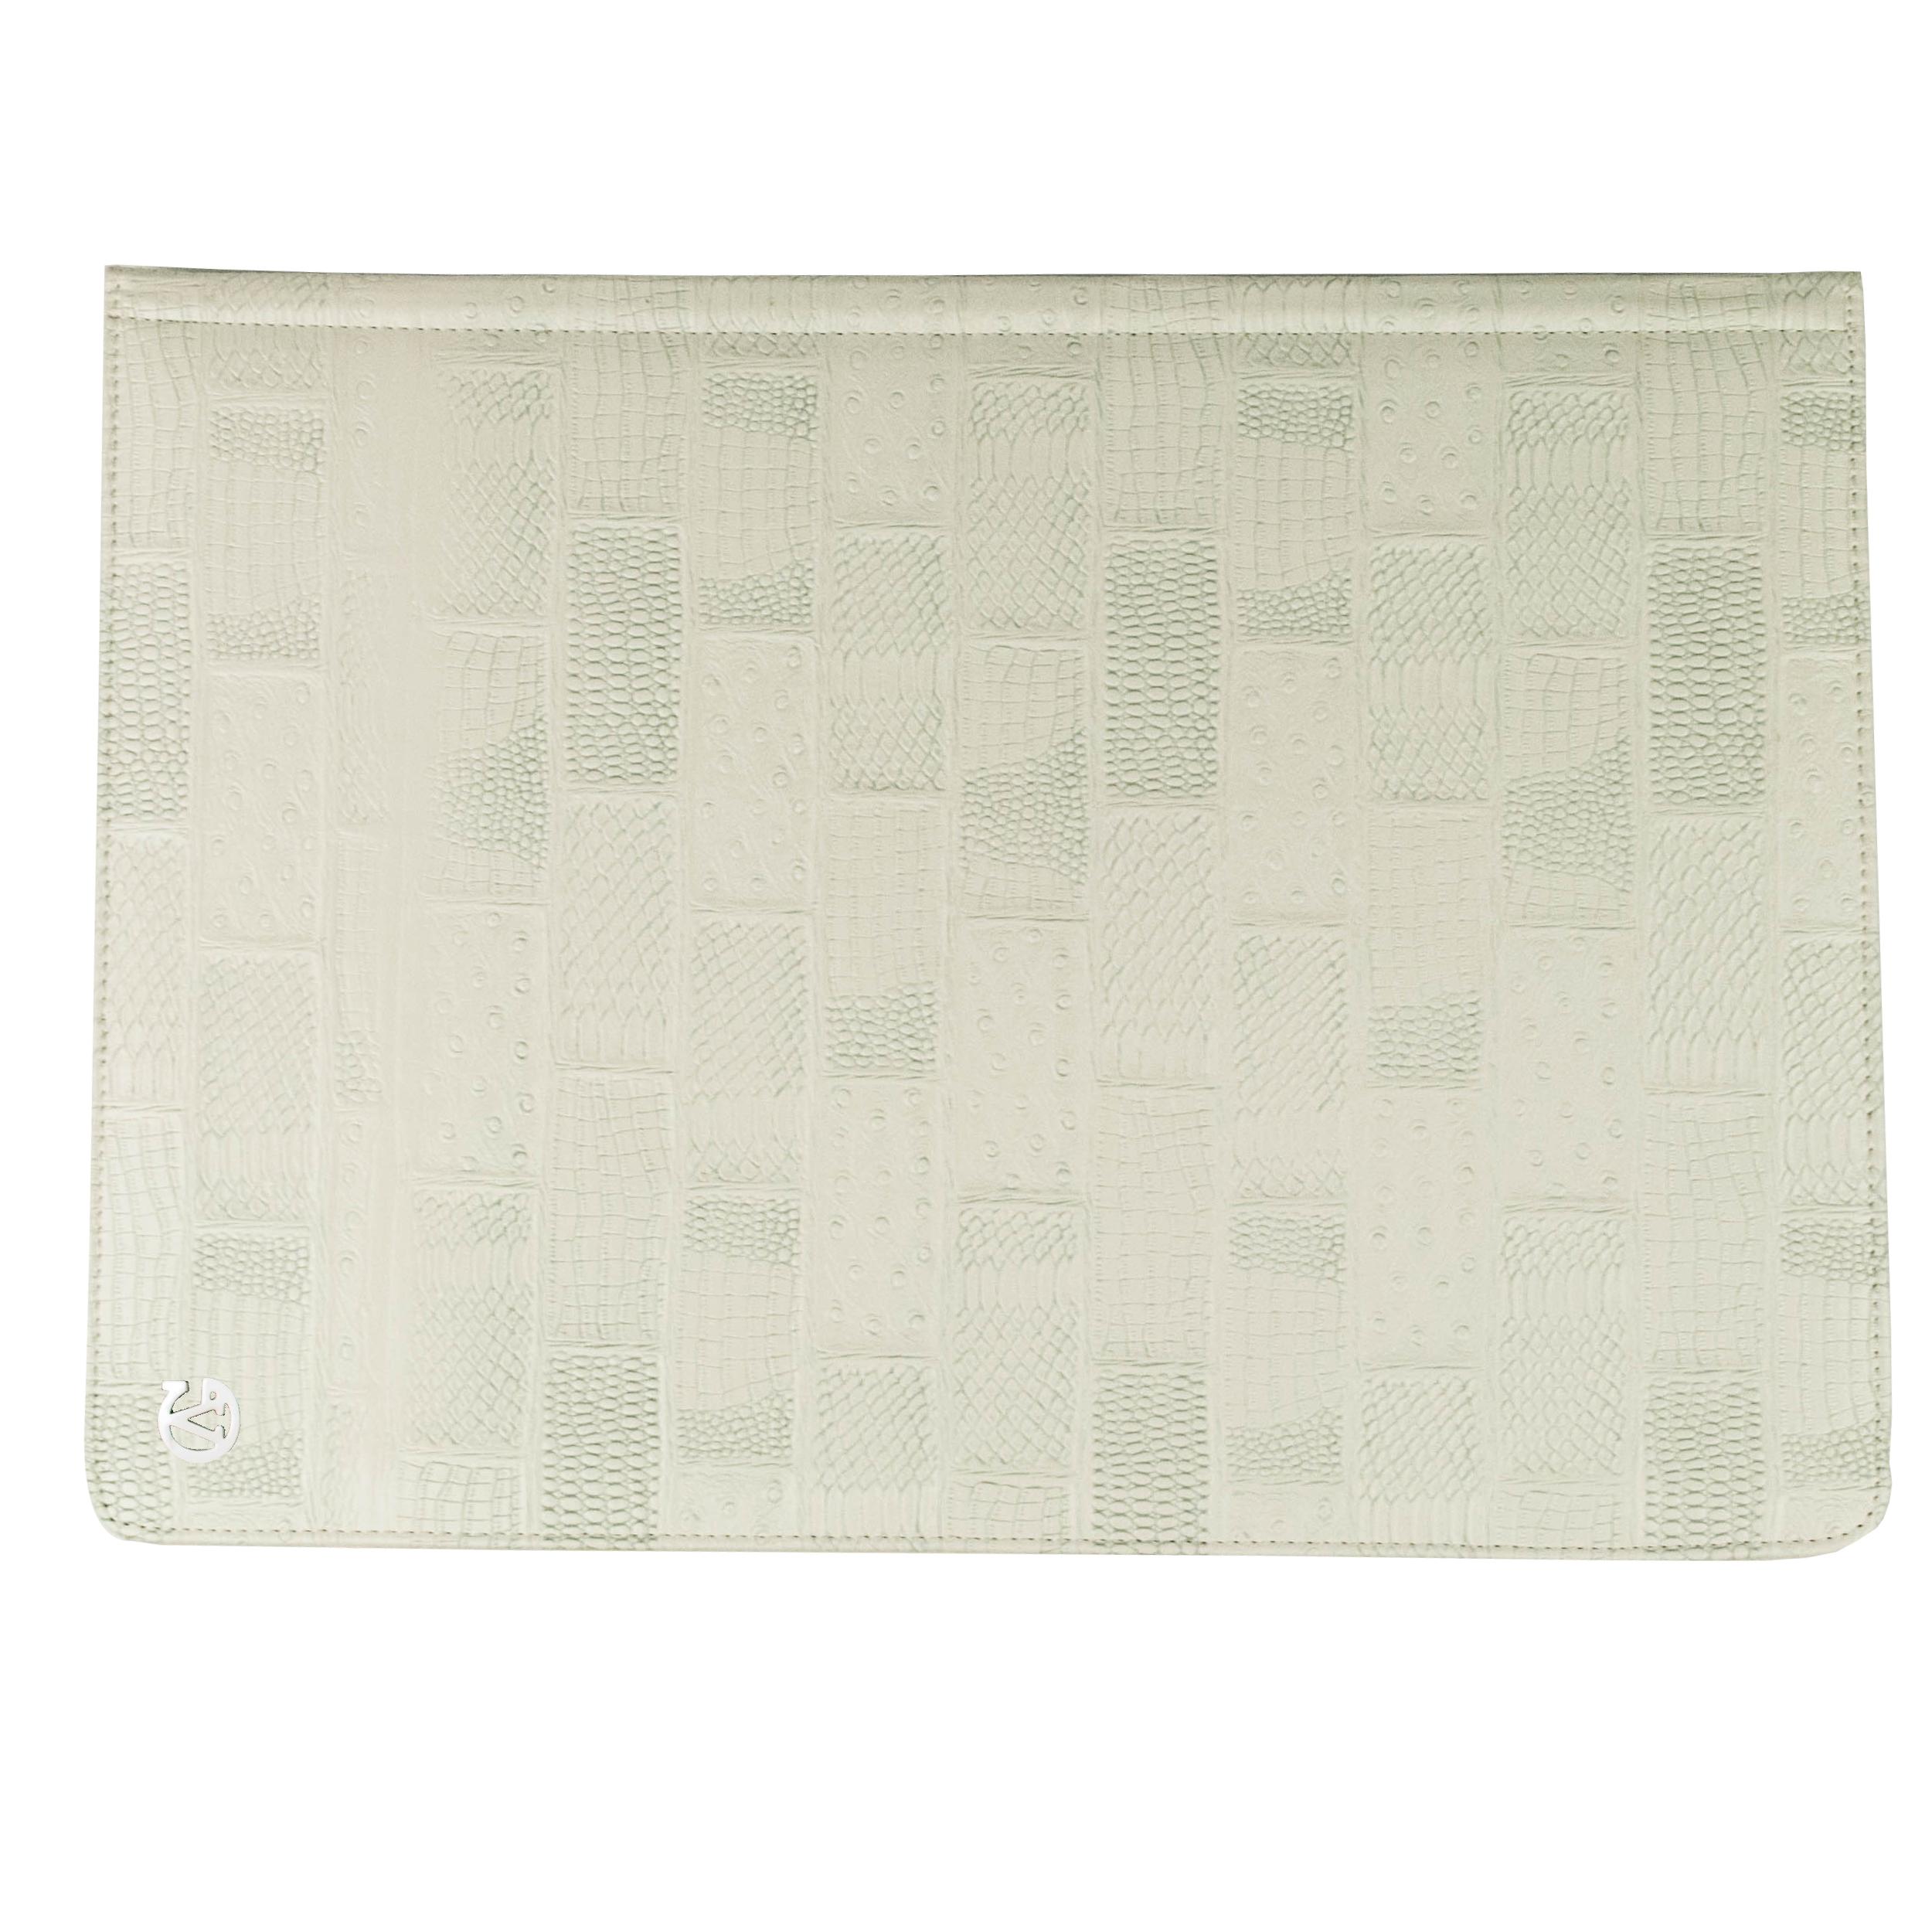 "Laptop Portfolio for 13"" Macbook (White)"